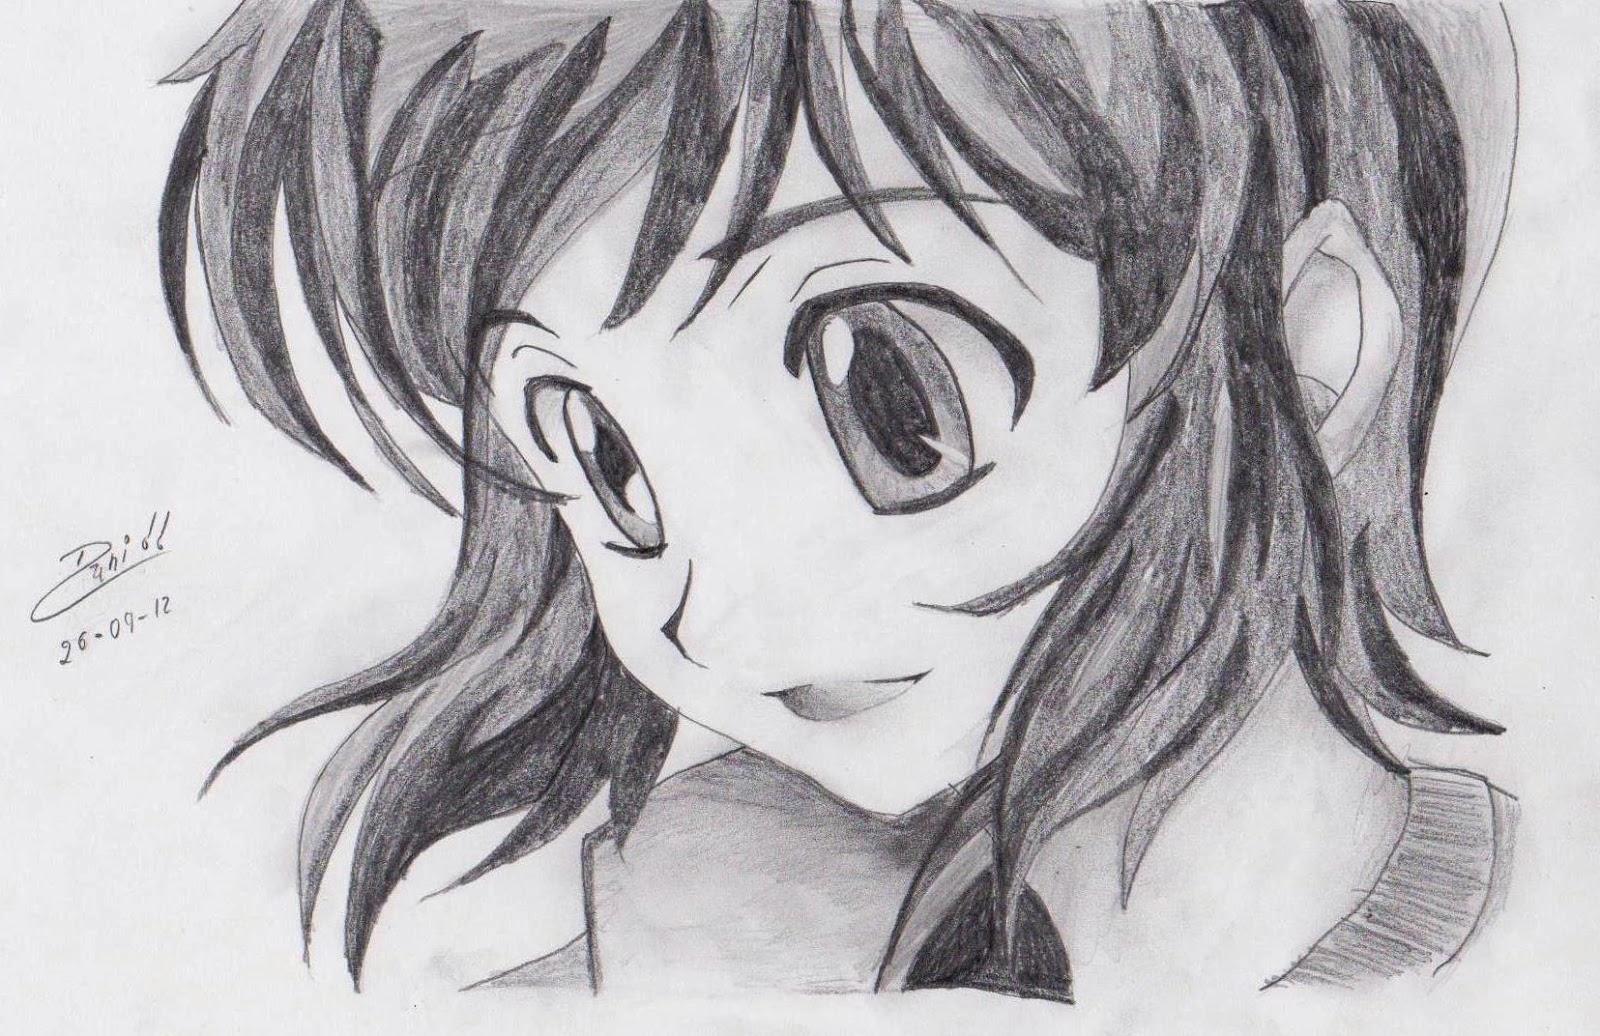 anime amor sombreados dibujos a lapiz: Dibujos De Amor: Dibujo De Amor A Lapiz